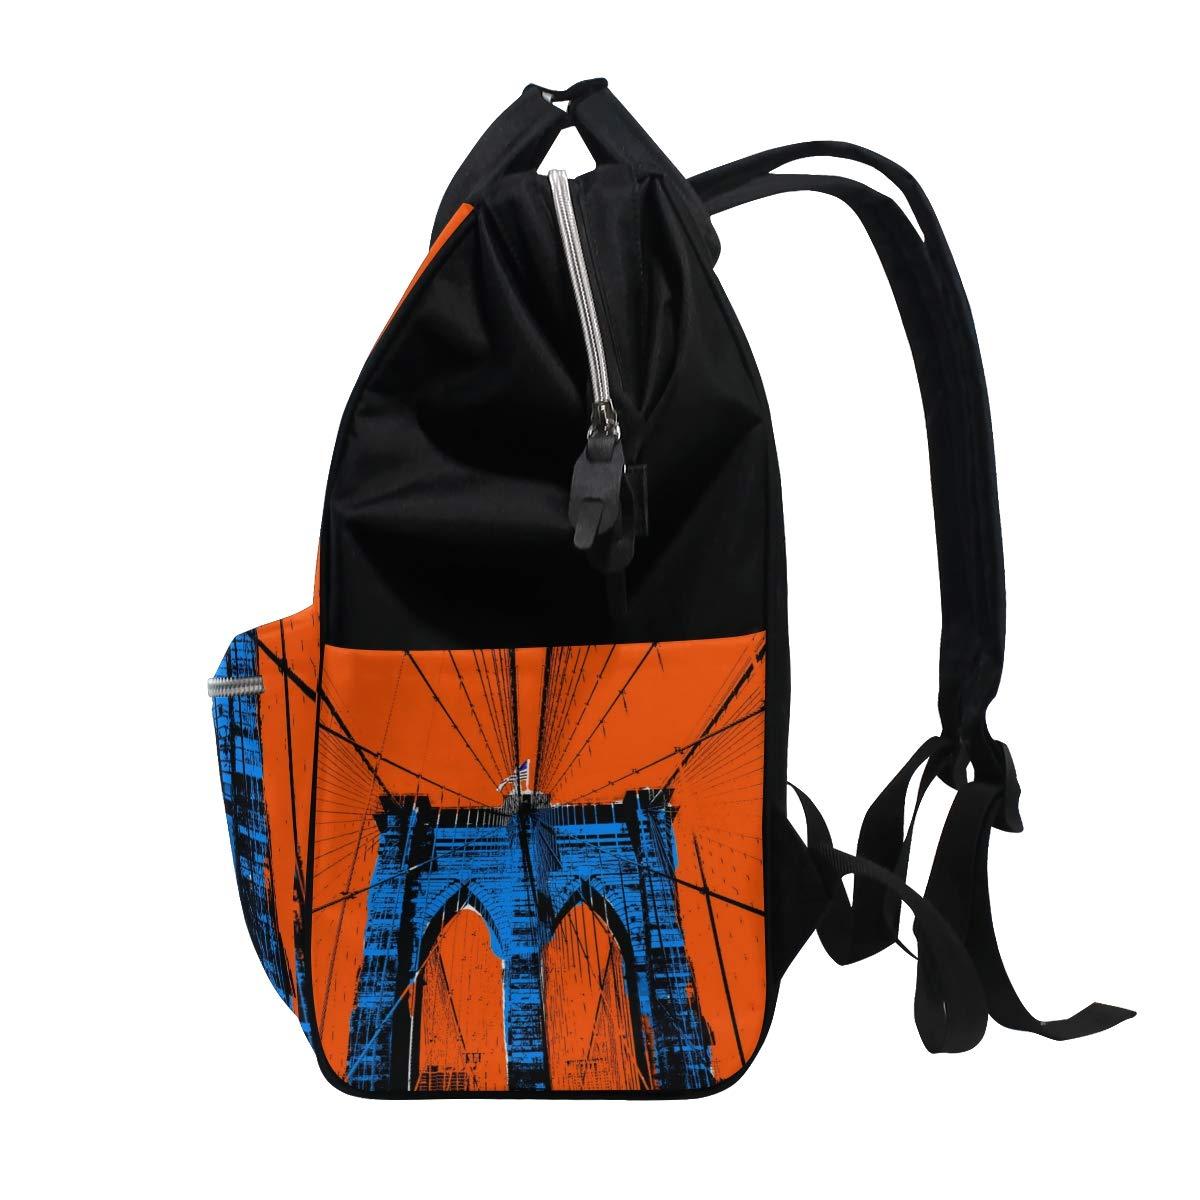 imobaby Amazing Brooklyn Bridge Landscape Changing Bags Large Capacity Handbags Canvas Shoulder Bag Backpack